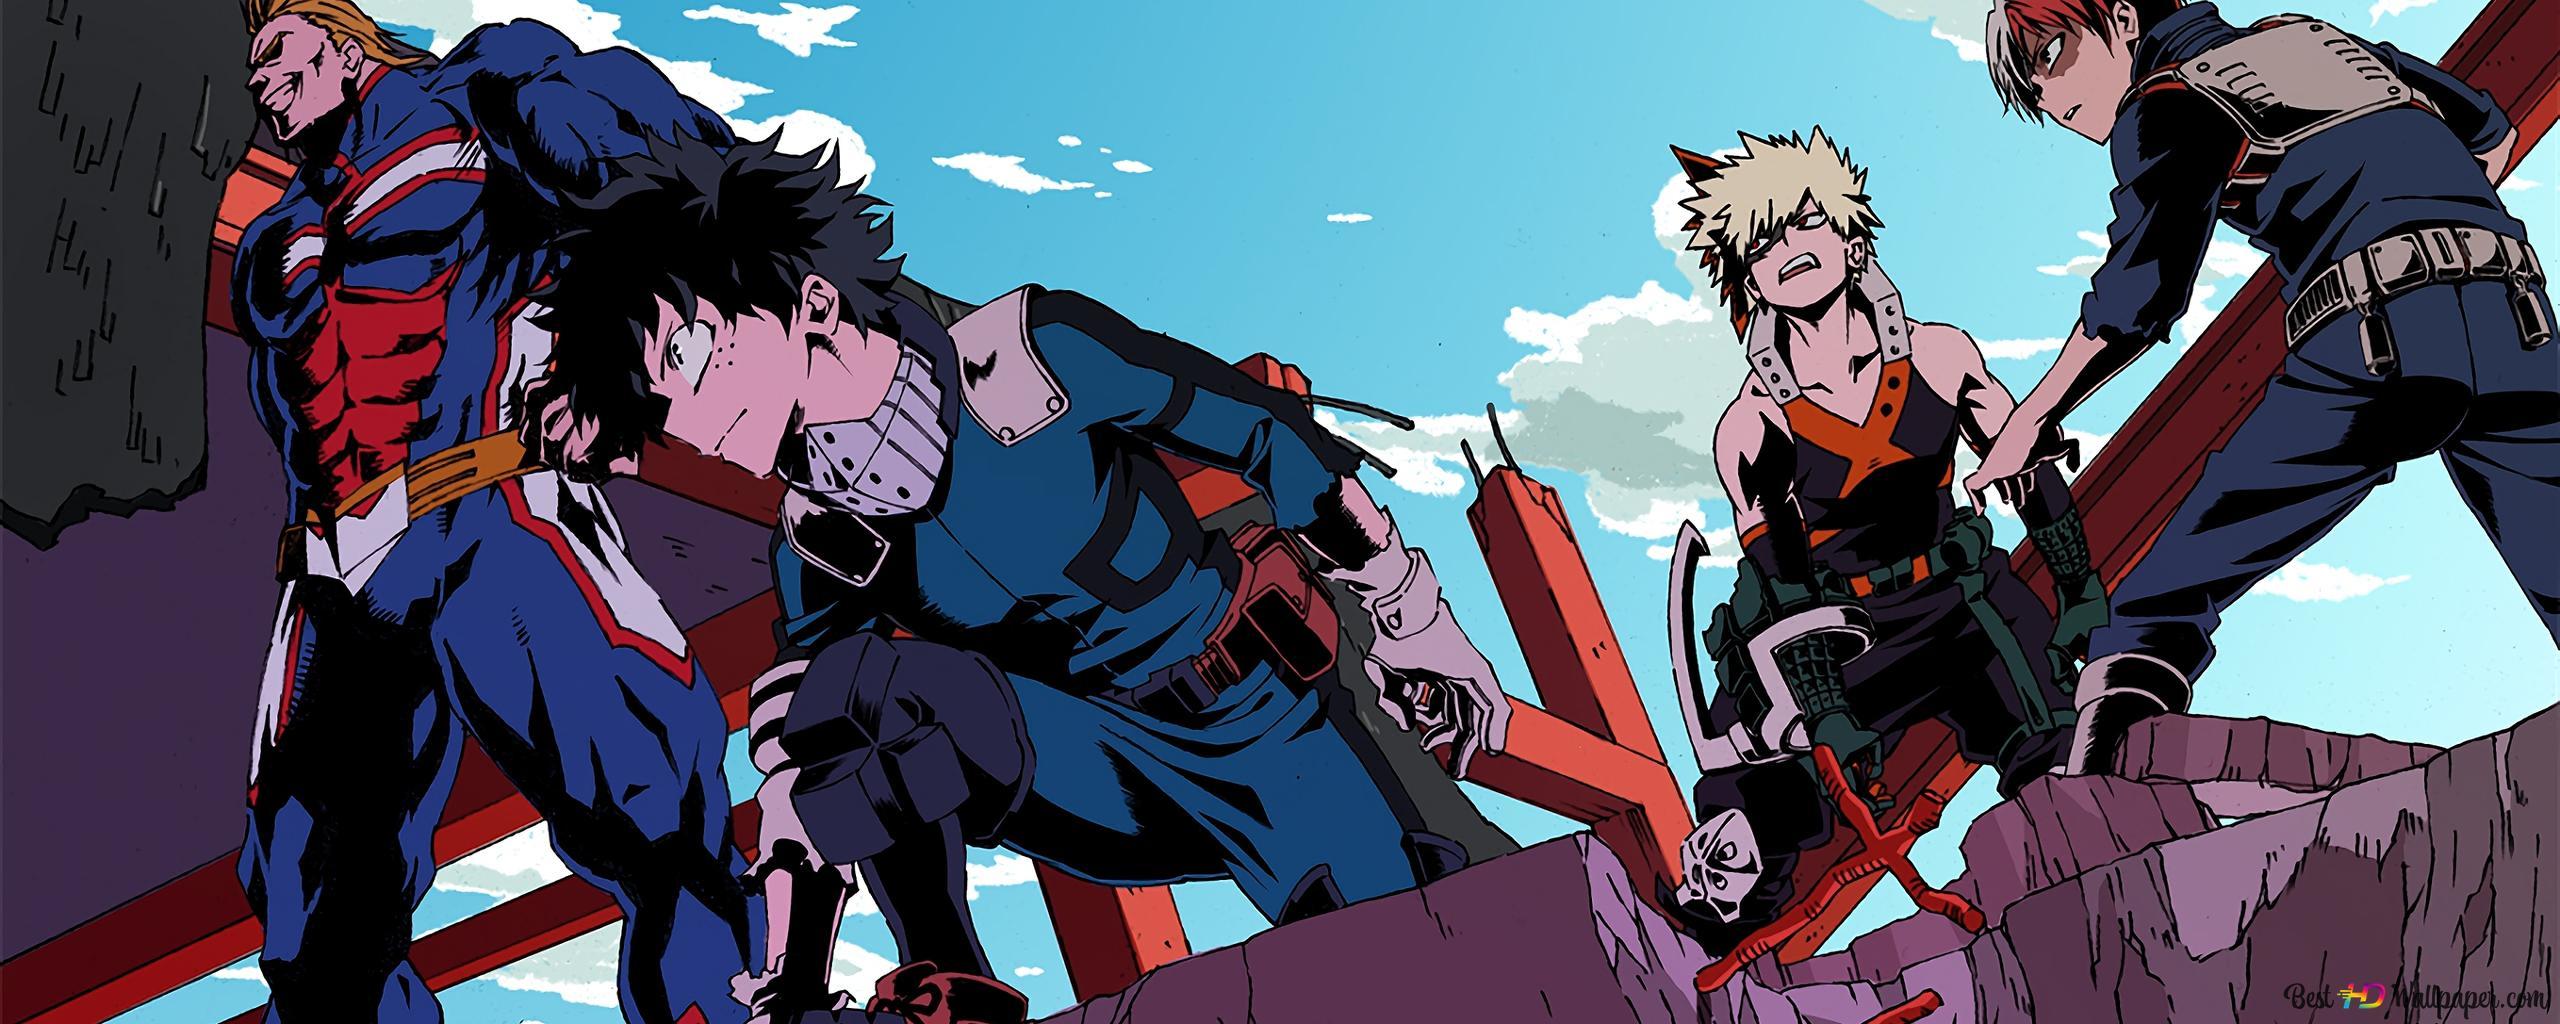 The Team Of My Hero Academia Hd Wallpaper Download